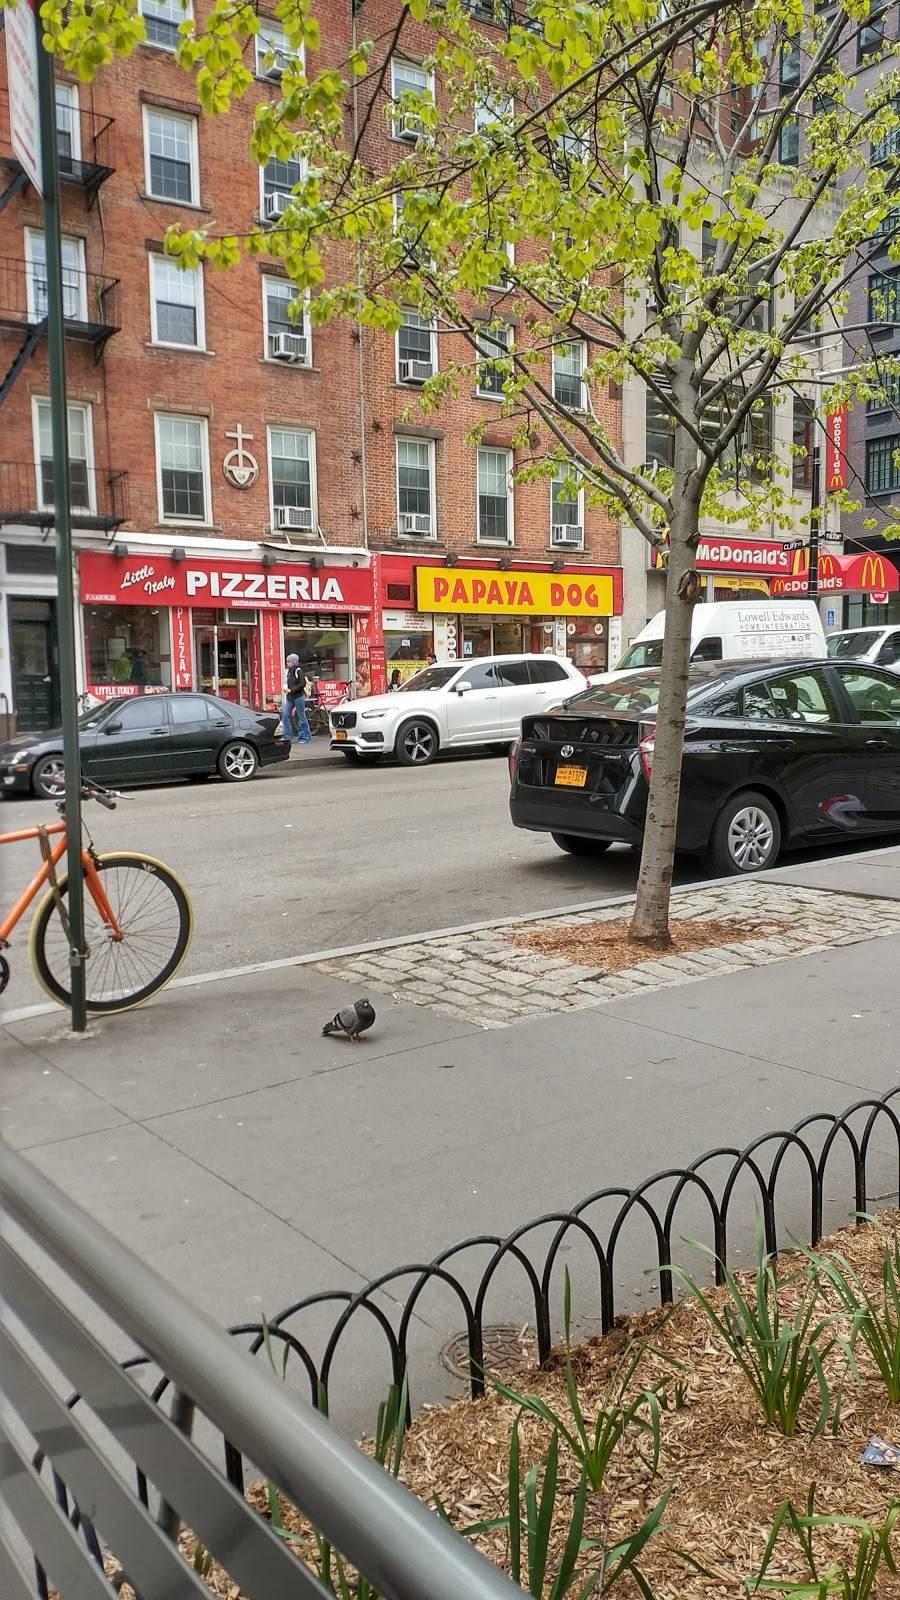 Papaya Dog | restaurant | 50 Fulton St, New York, NY 10038, USA | 2122270777 OR +1 212-227-0777